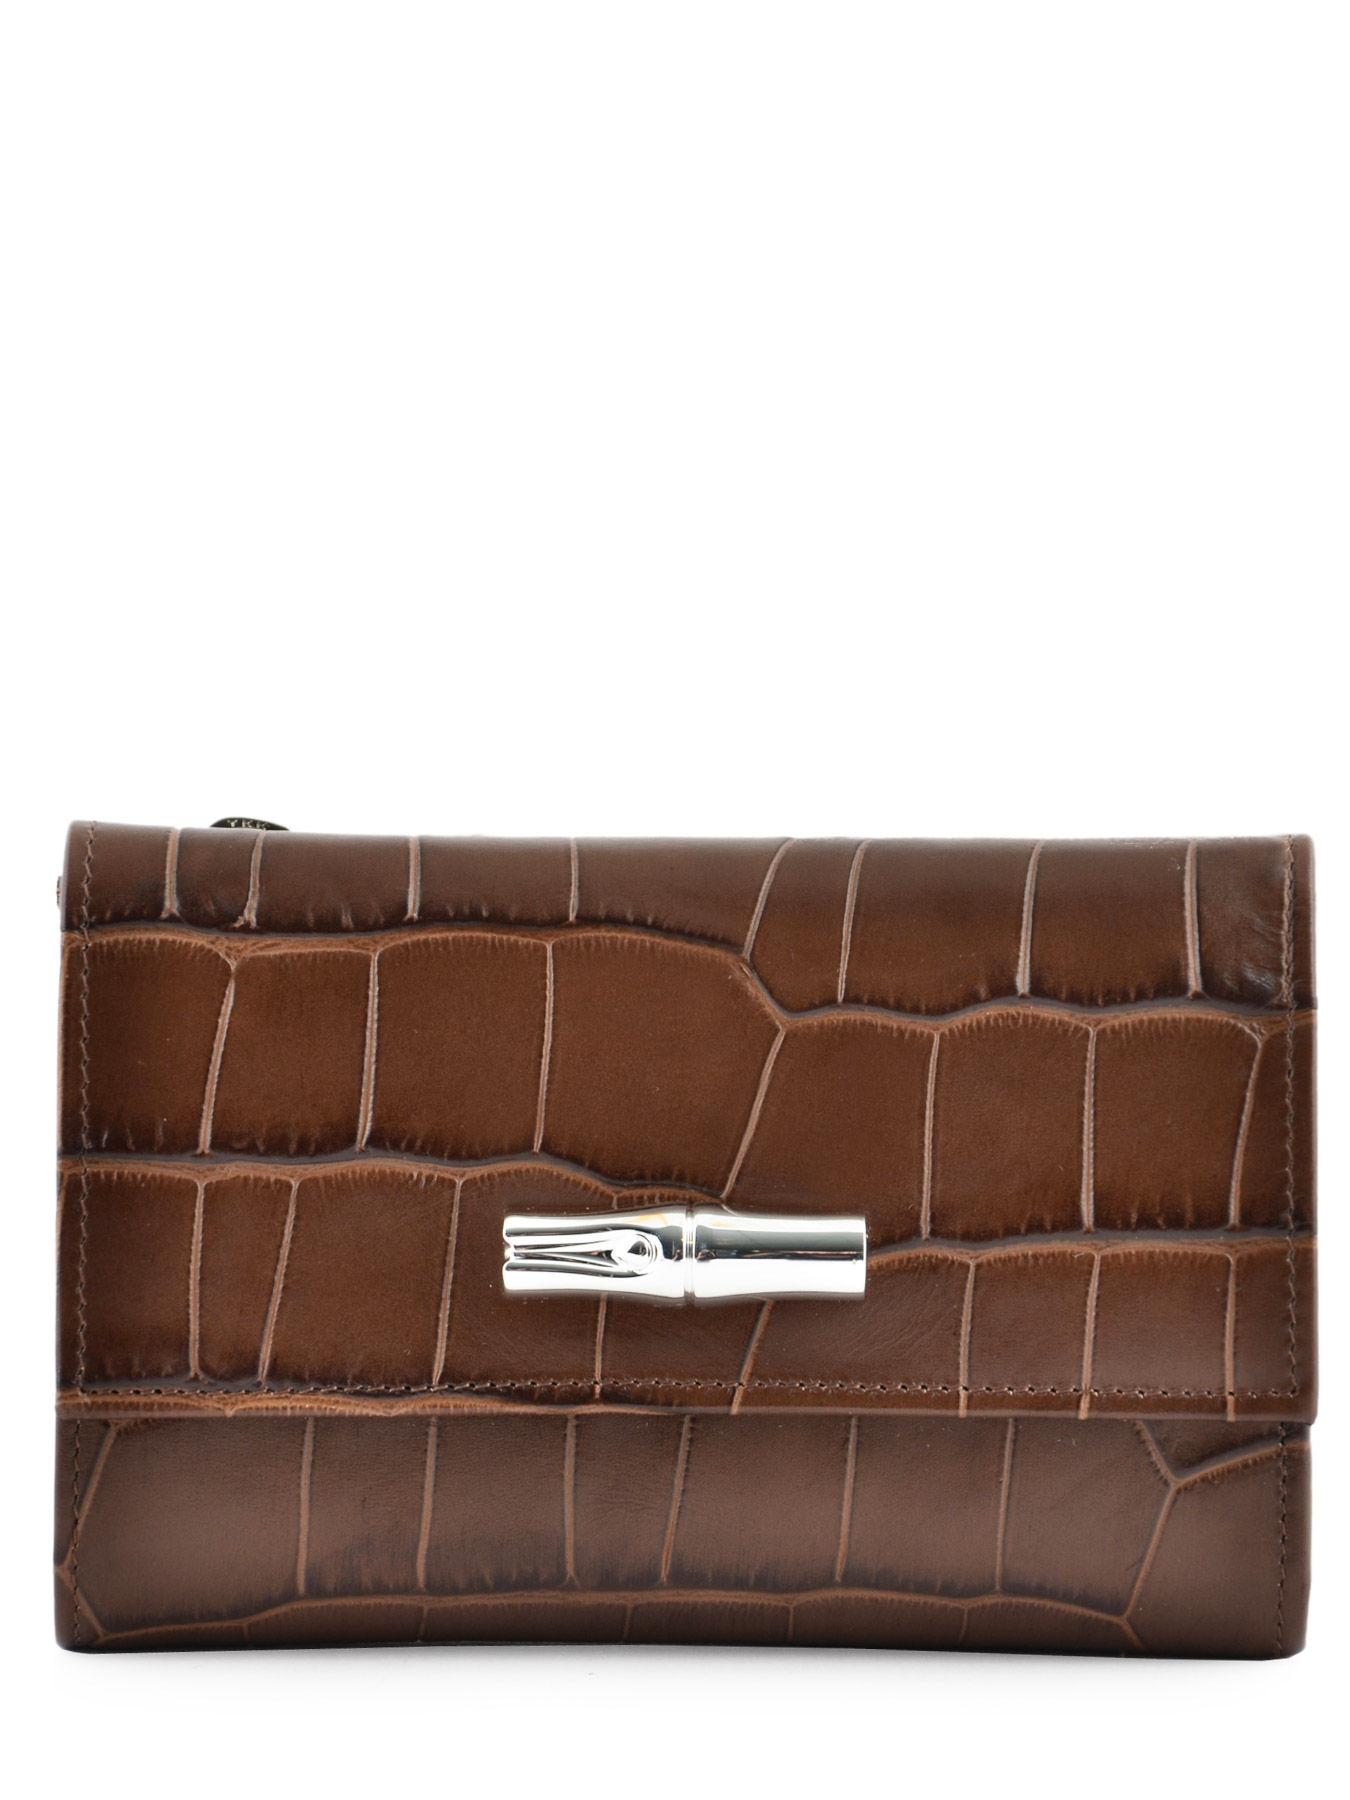 Longchamp Wallet Brown